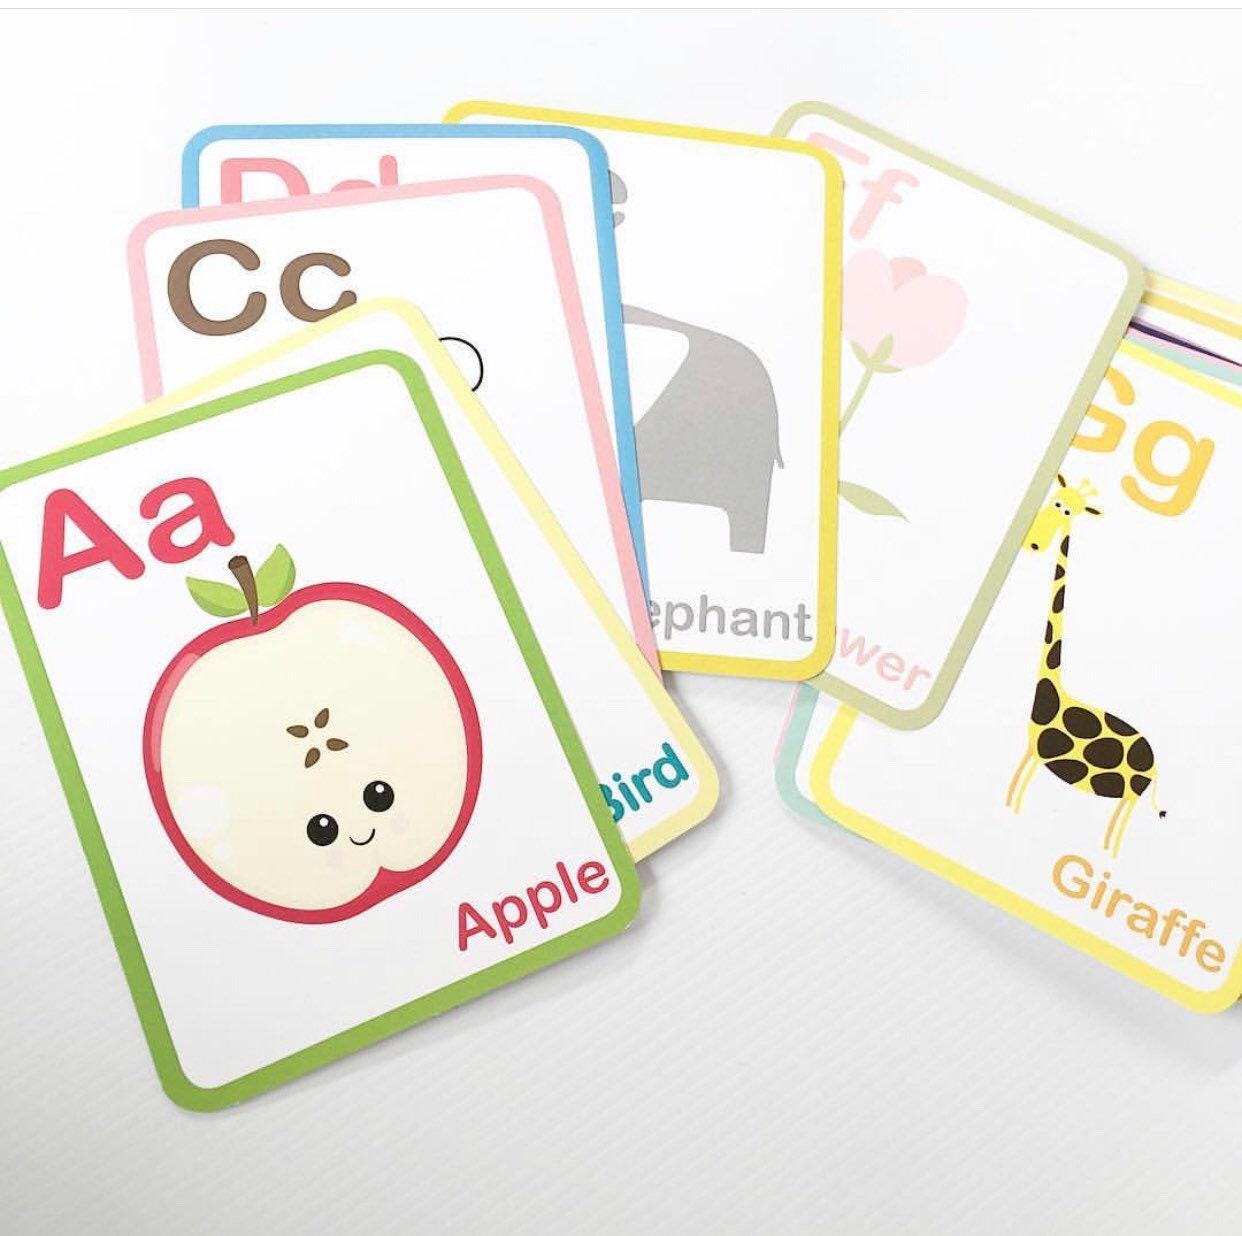 Educational Aid   Montessori Cards   Alphabet Cards   Montessori Gift    Toddler Gift Idea   Gift for Kids   Preschool Gift   Xmas